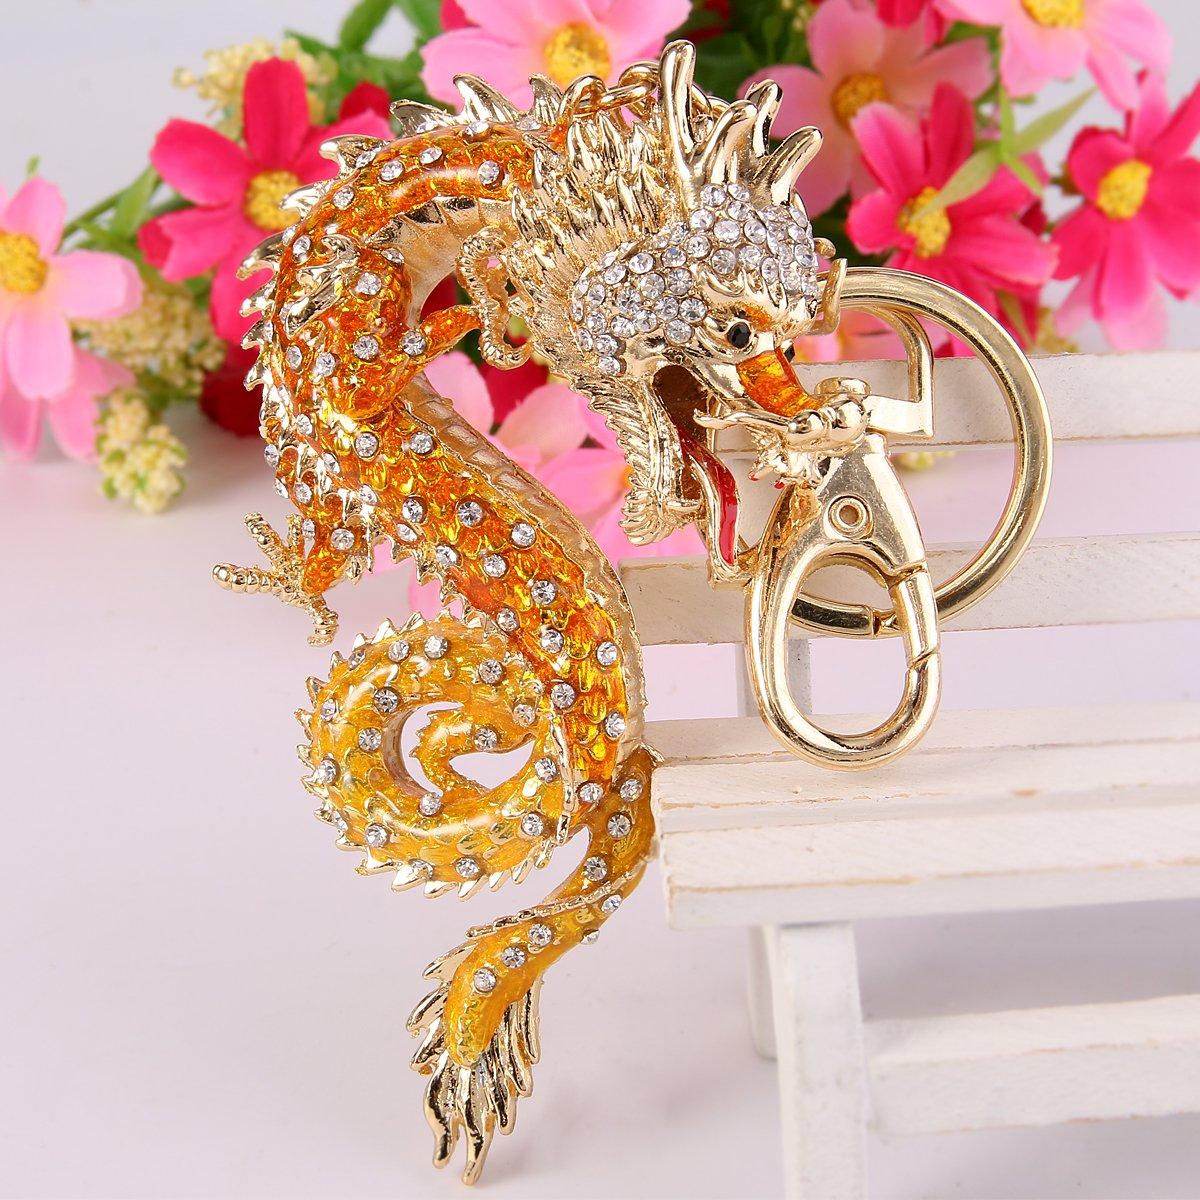 Goldton orange Emaille Fuchs Anhänger Halskette